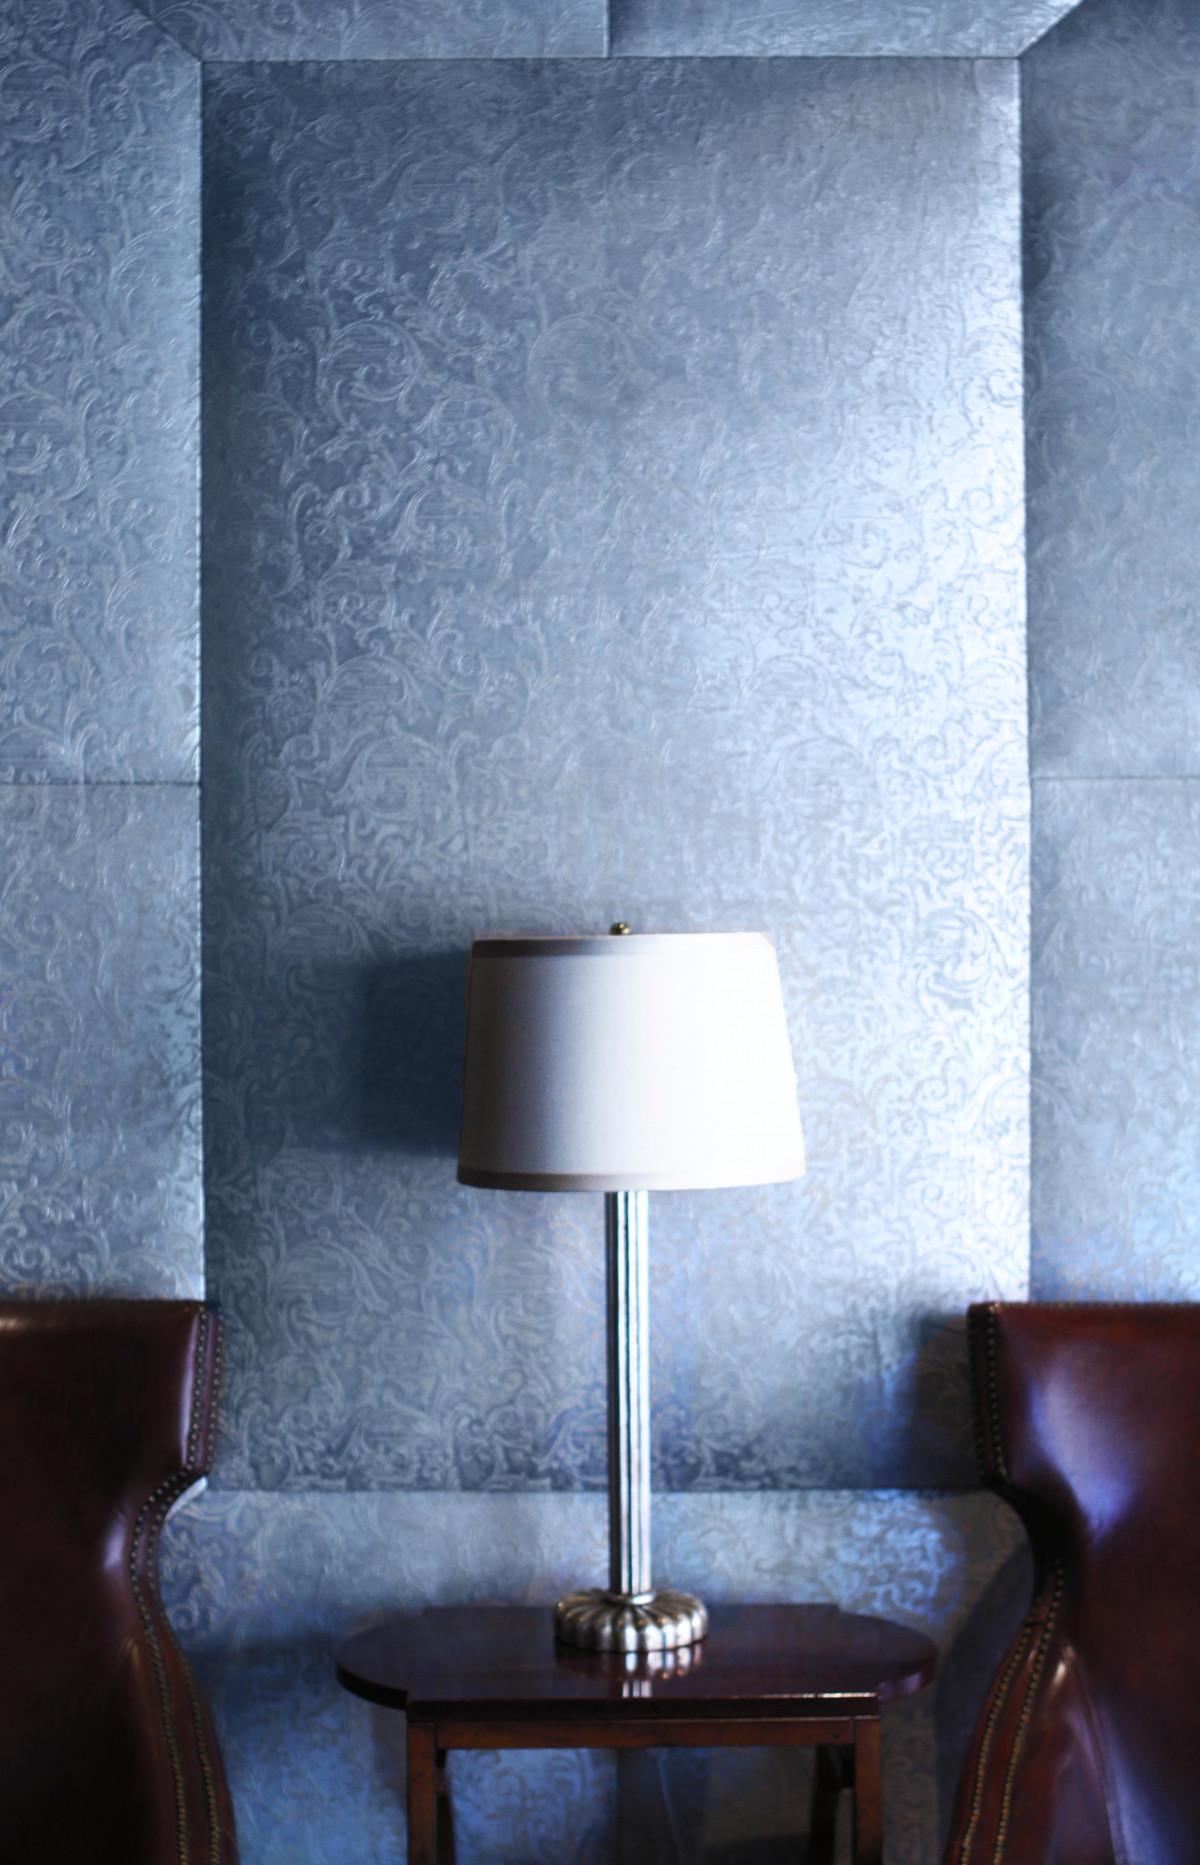 Fotos gratis piso antiguo pared azulejo lavabo for Diseno de interiores online gratis